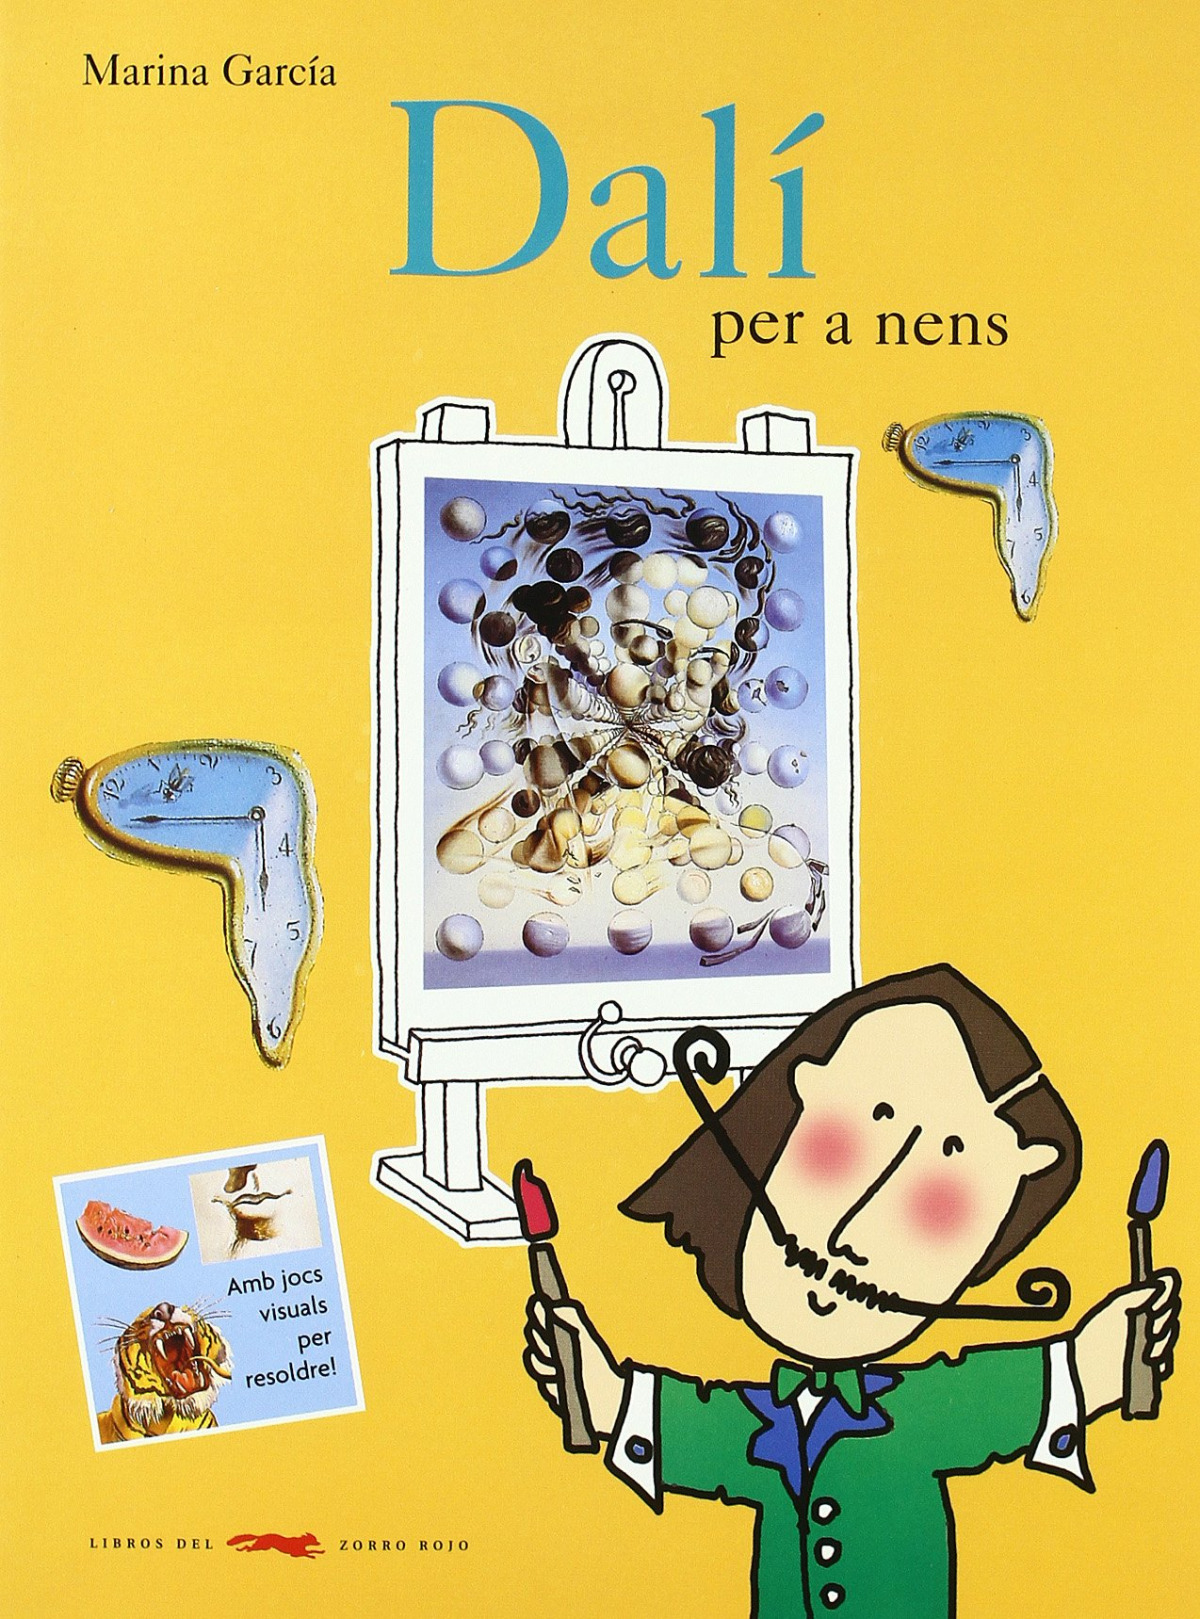 Dalí per a nens